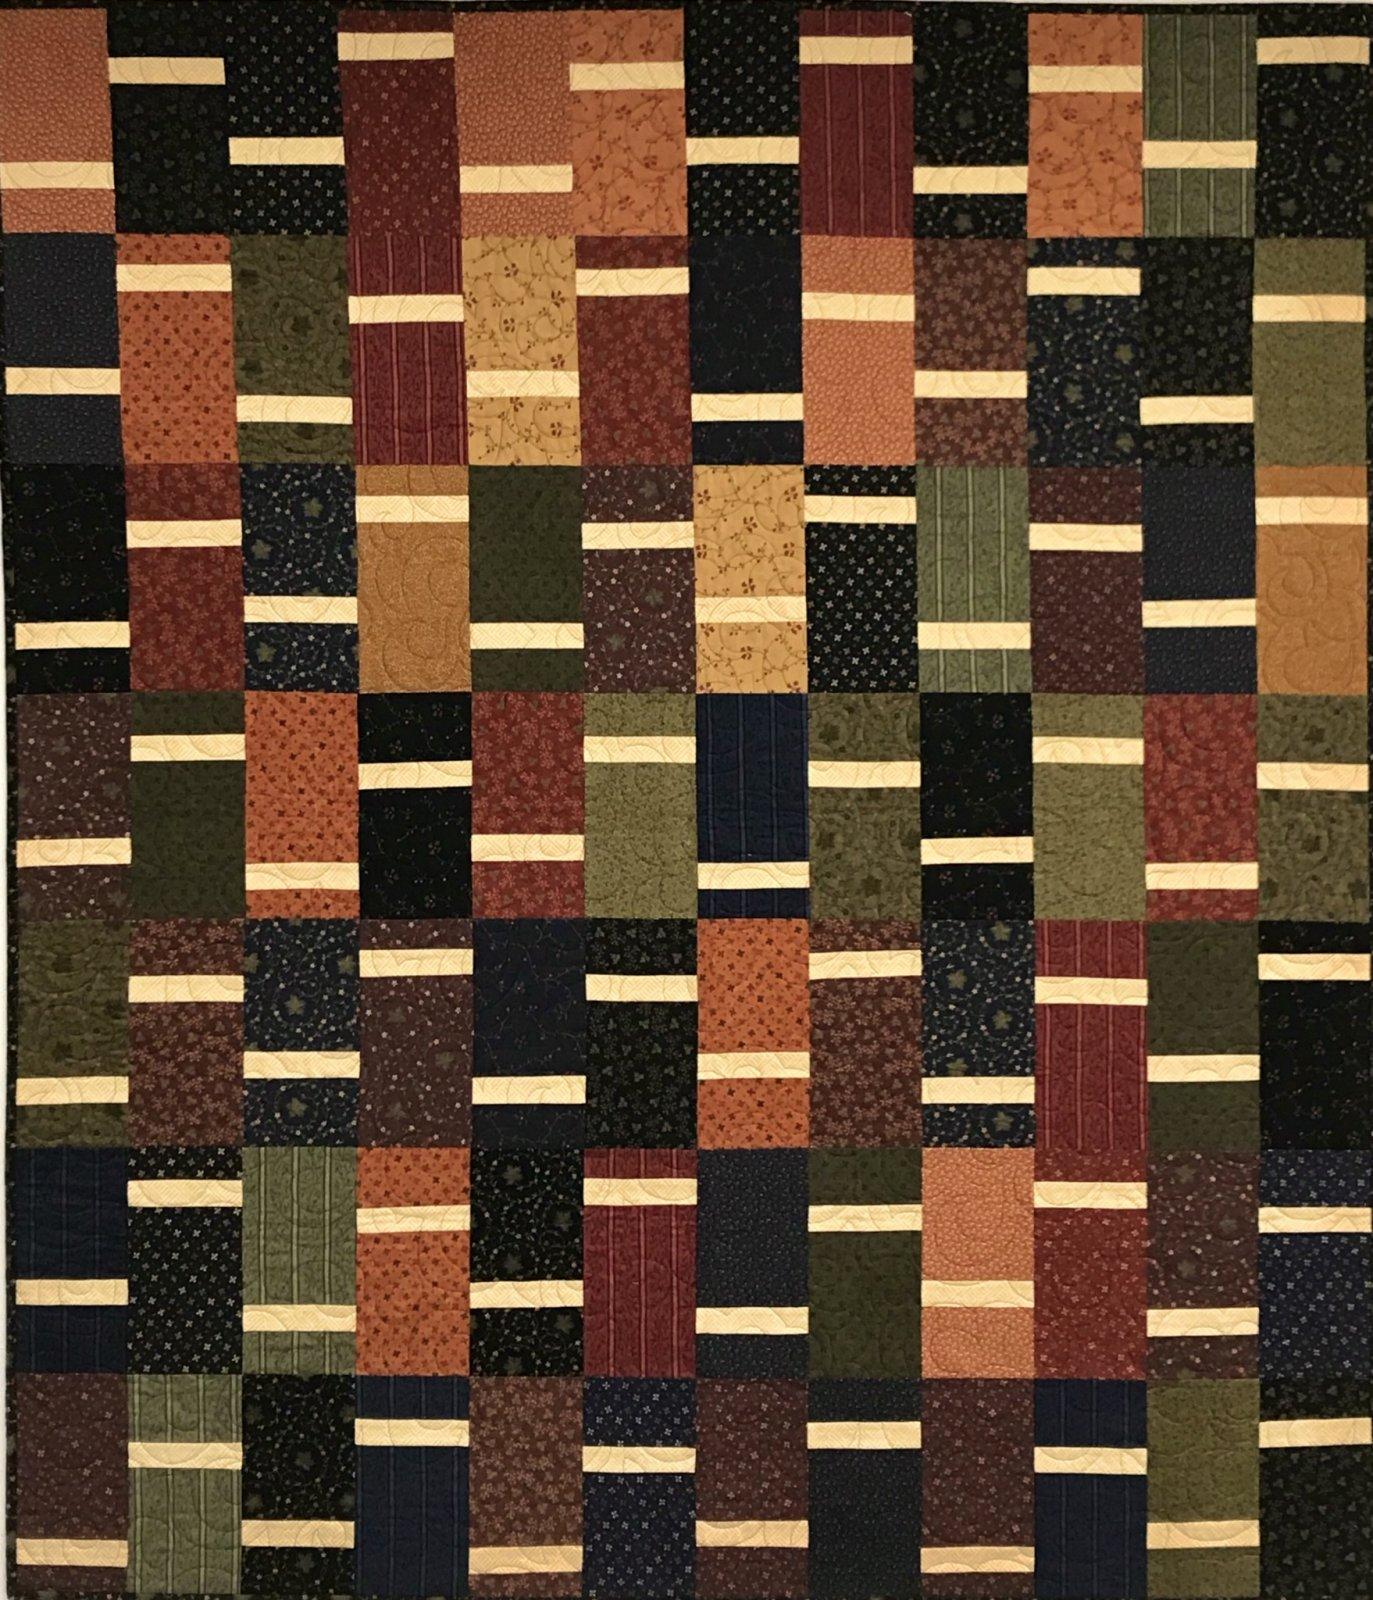 Dayhike Flannel Quilt Kit